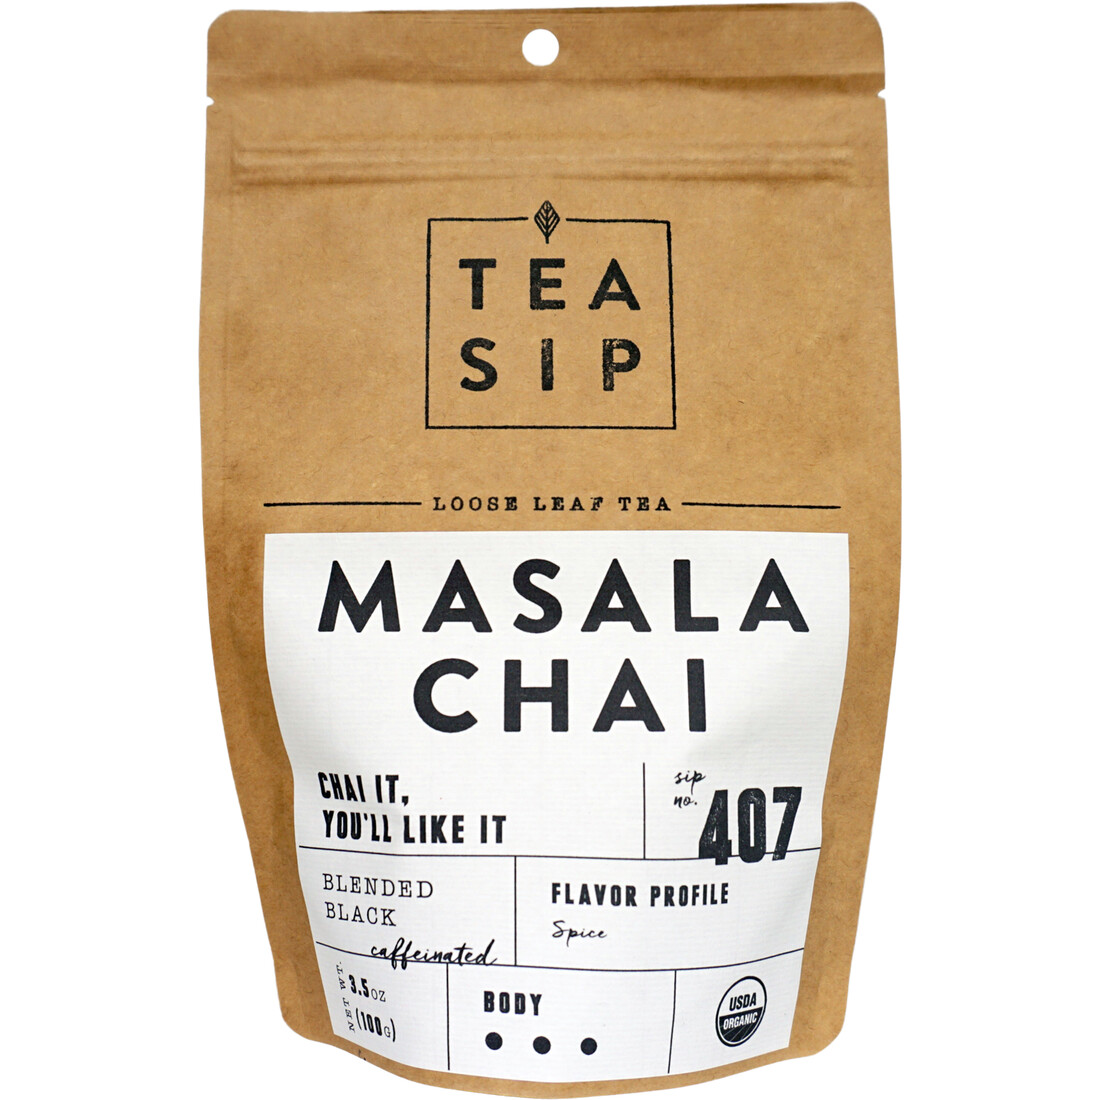 Masala Chai 3.5 oz